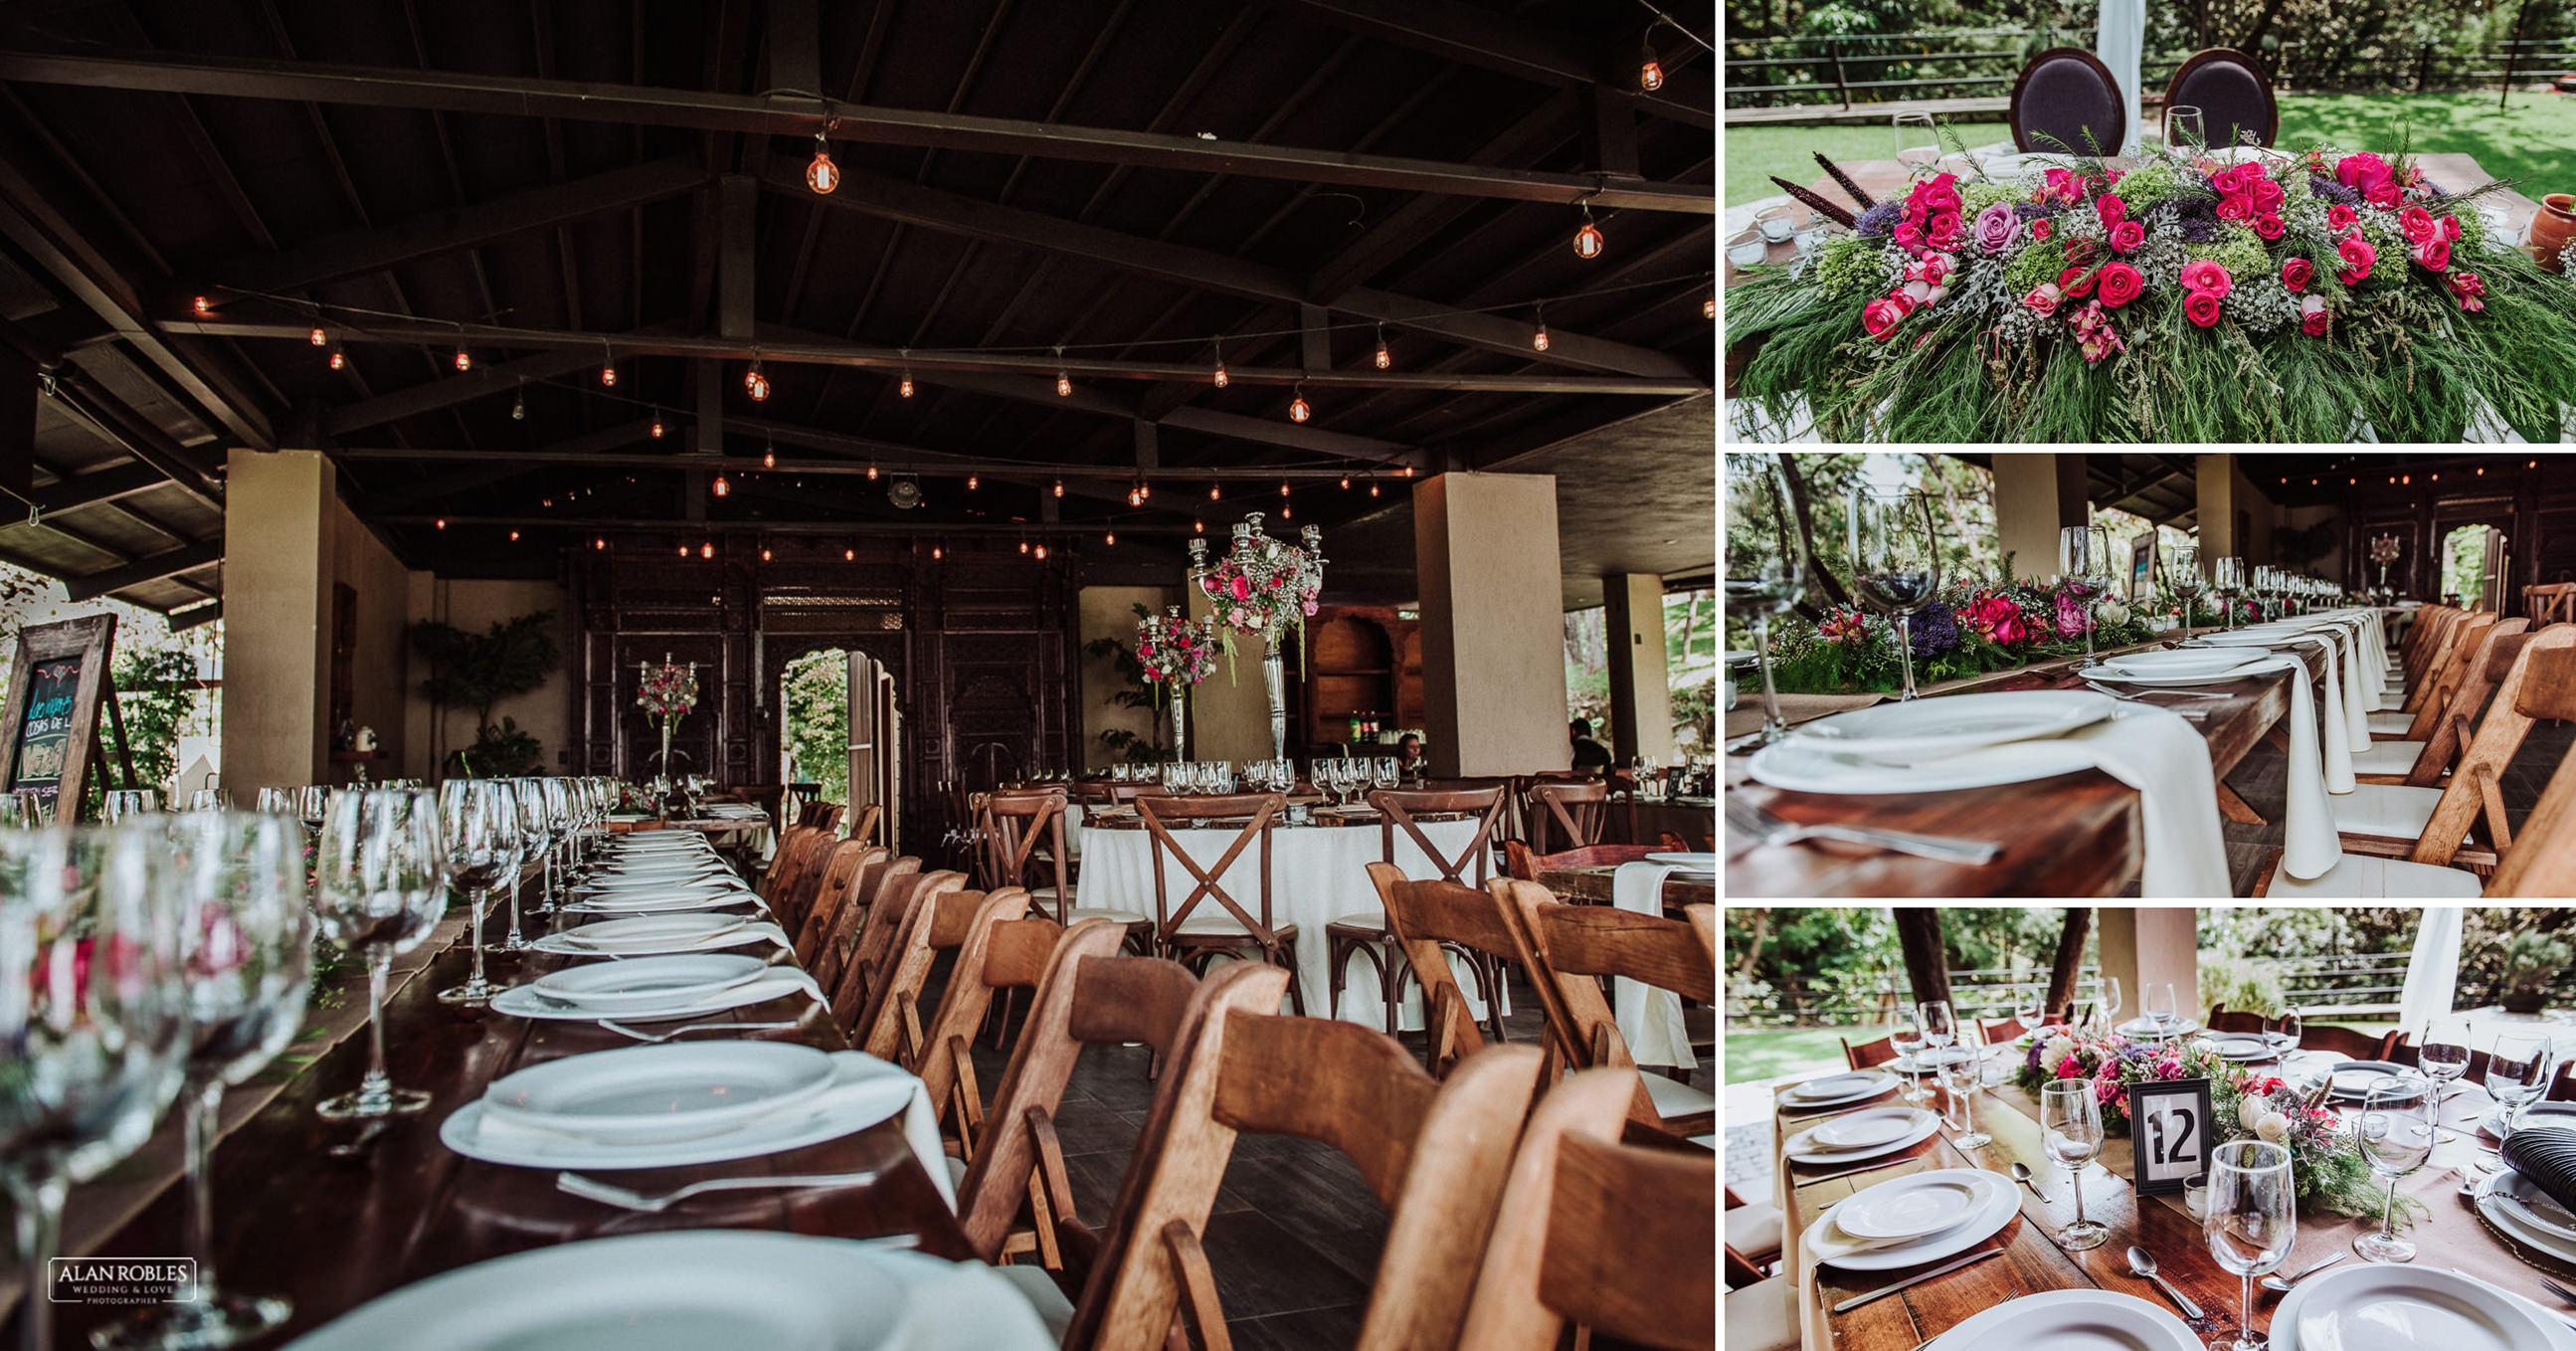 Fotografo de bodas guadalajara Alan Robles - Pinare terraza bistro 3